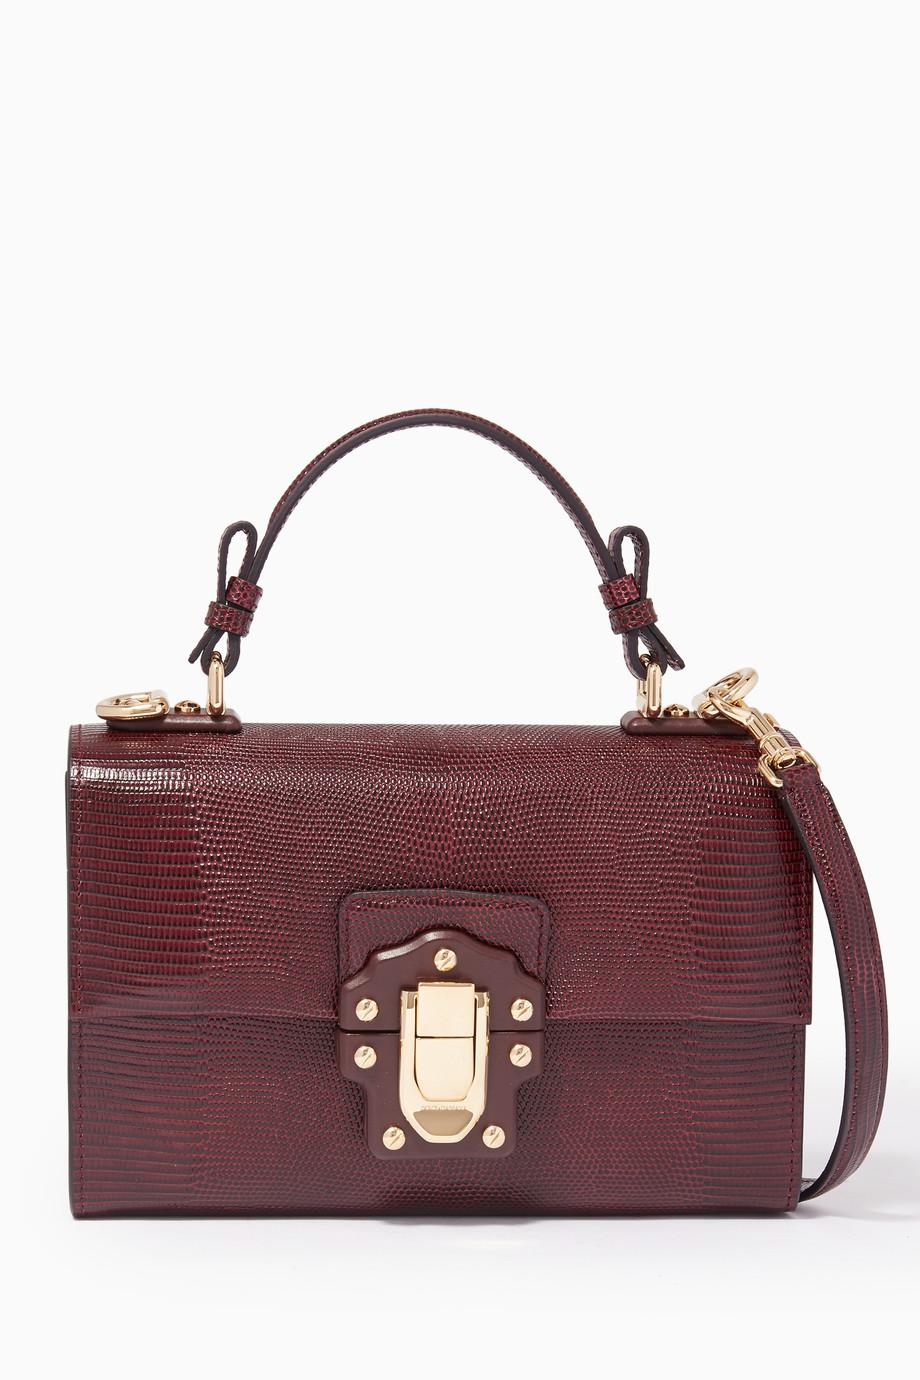 eccca0d9c609 Shop Dolce   Gabbana Purple Dark-Red Lucia Top-Handle Bag for Women ...